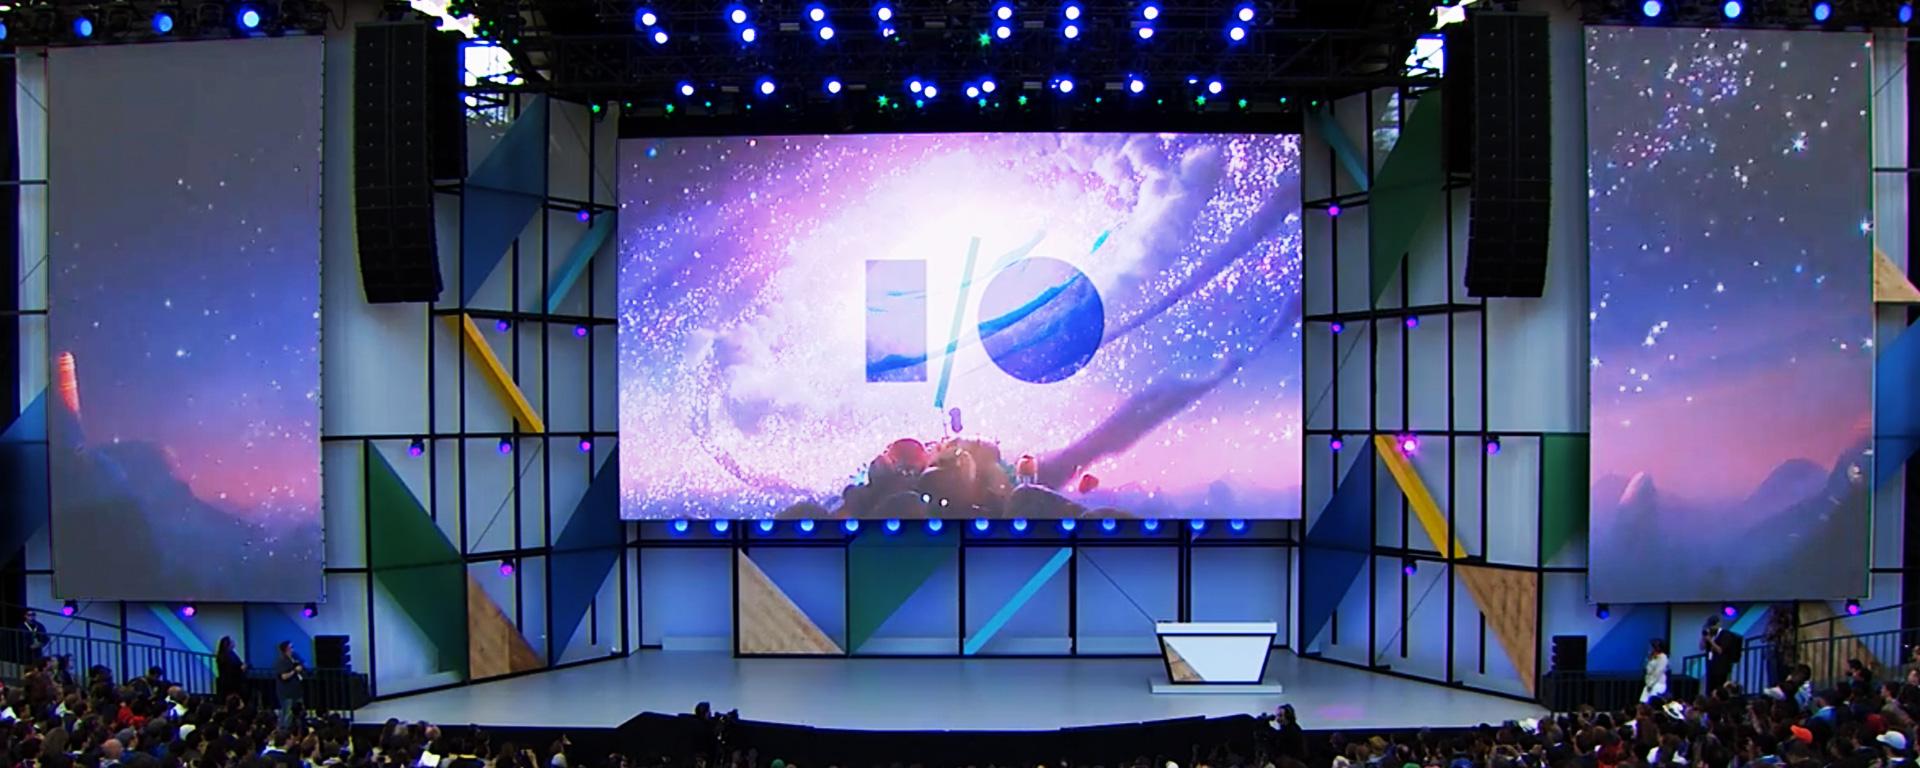 Google I/O 2017 基調講演を完全網羅! Google.aiの取り組みやGoogle Homeのアップデートなど 13 の革新的なテクノロジー